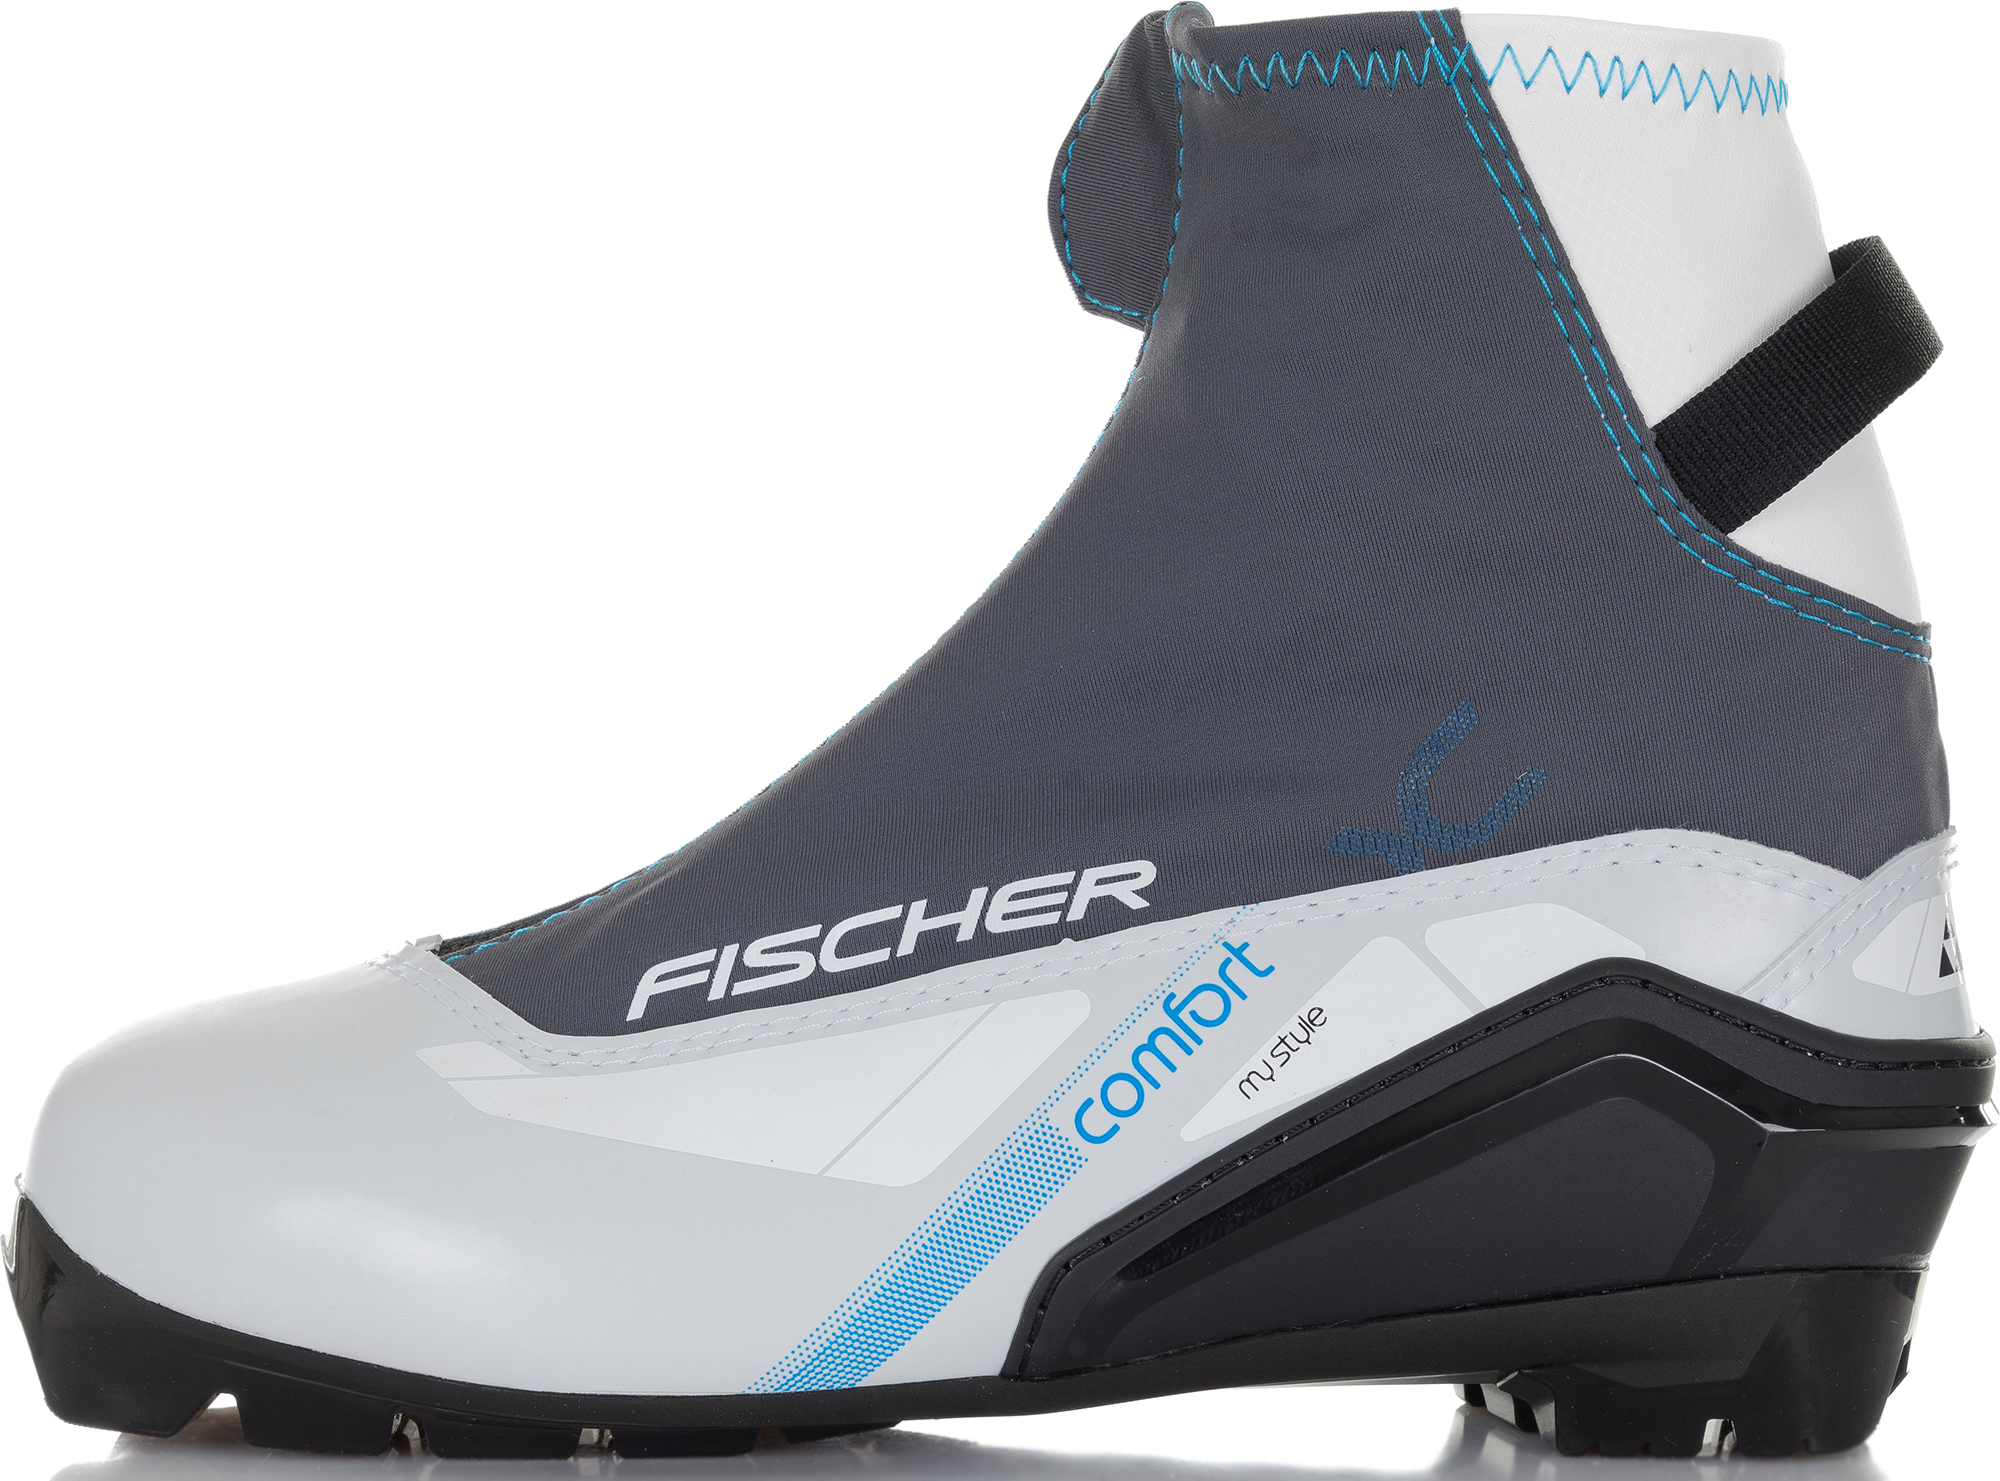 Fischer Ботинки для беговых лыж женские Xc Comfort My Style